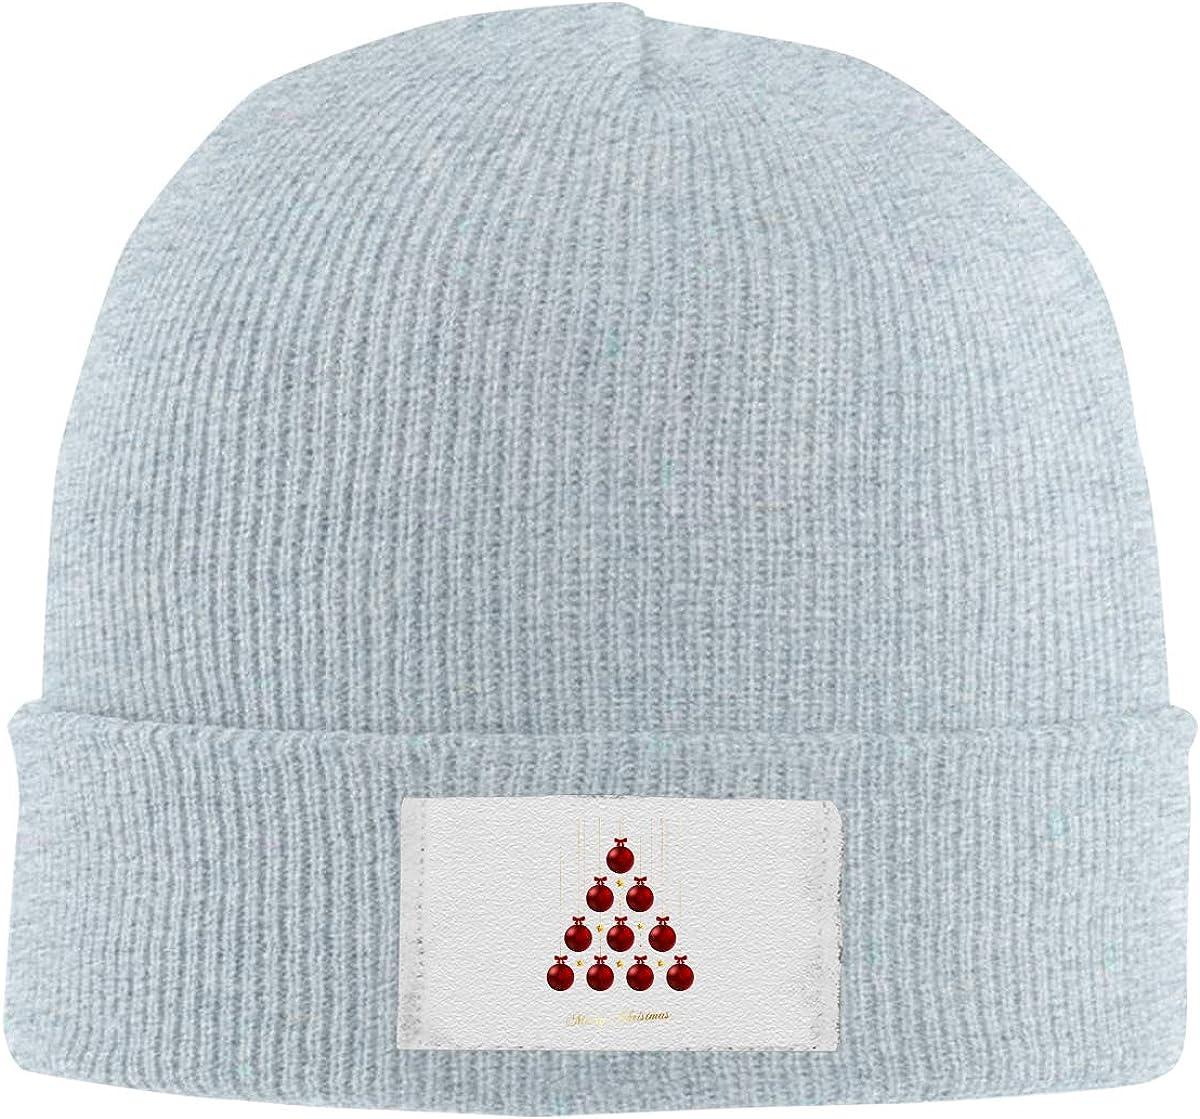 Stretchy Cuff Beanie Hat Black Skull Caps Merry Chrismas Ball Winter Warm Knit Hats